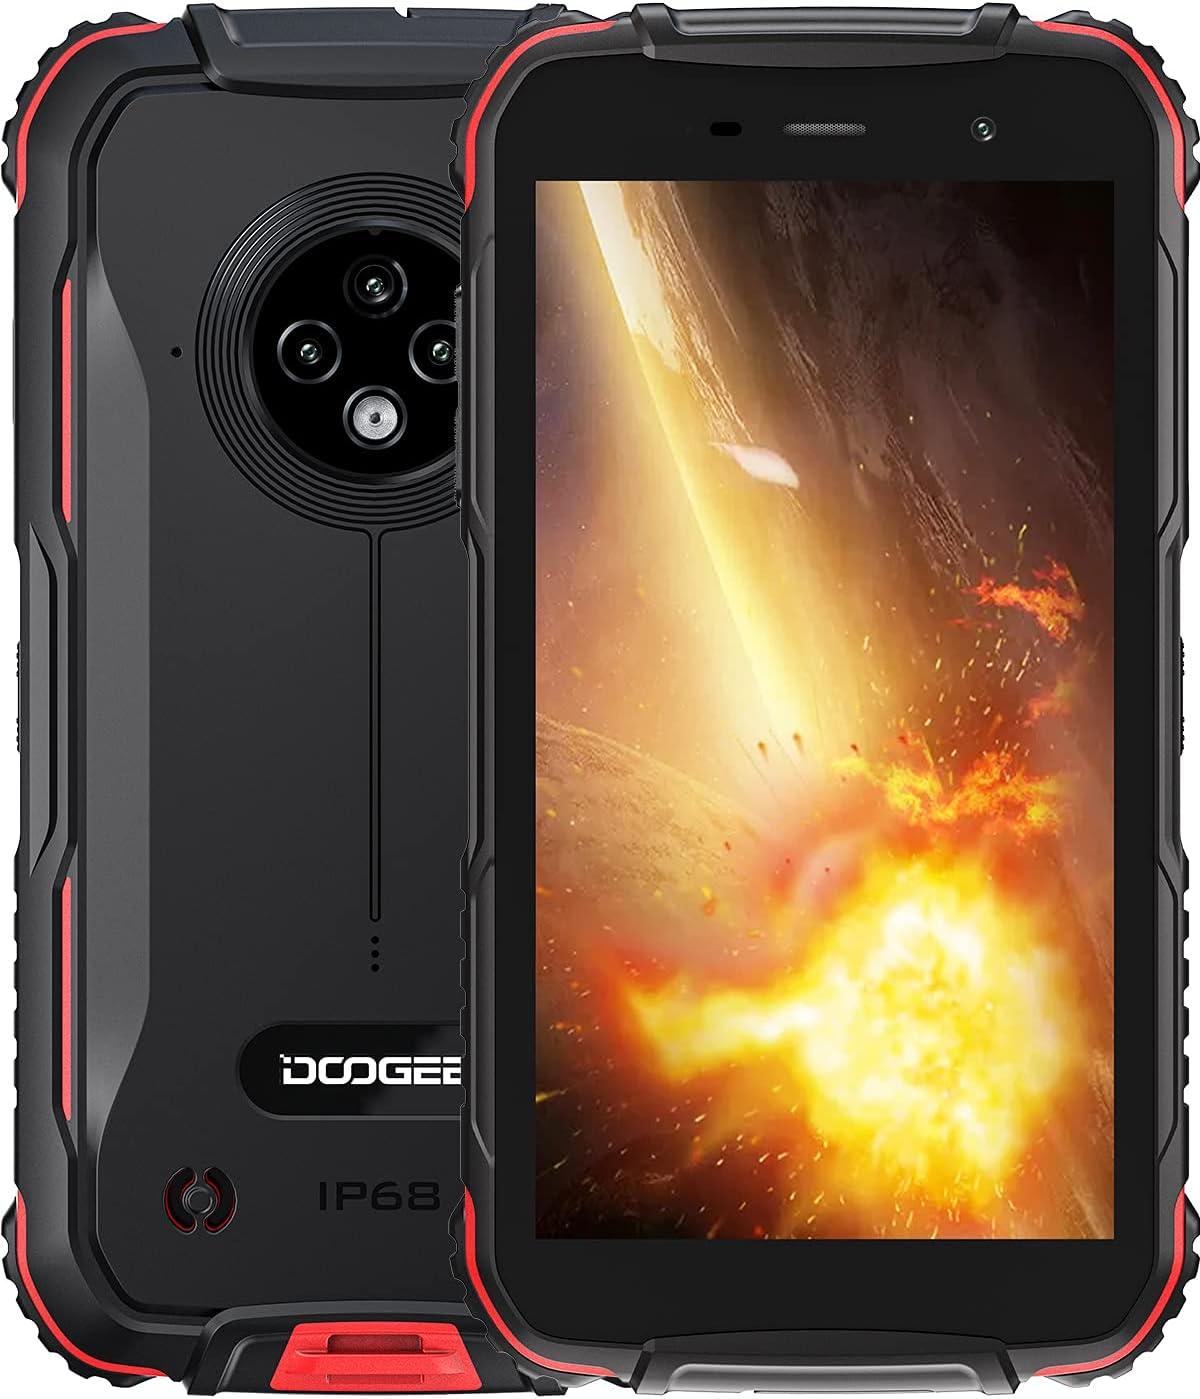 DOOGEE S35 [2021] Movil Resistente Smartphone Telefono Antigolpes Agua y Golpes 4G Libre Android 4350mAh Batería IP68 2GB RAM + 16GB ROM 13MP Triple Cámara 5.0 Corning Gorilla Glass Pantalla GPS